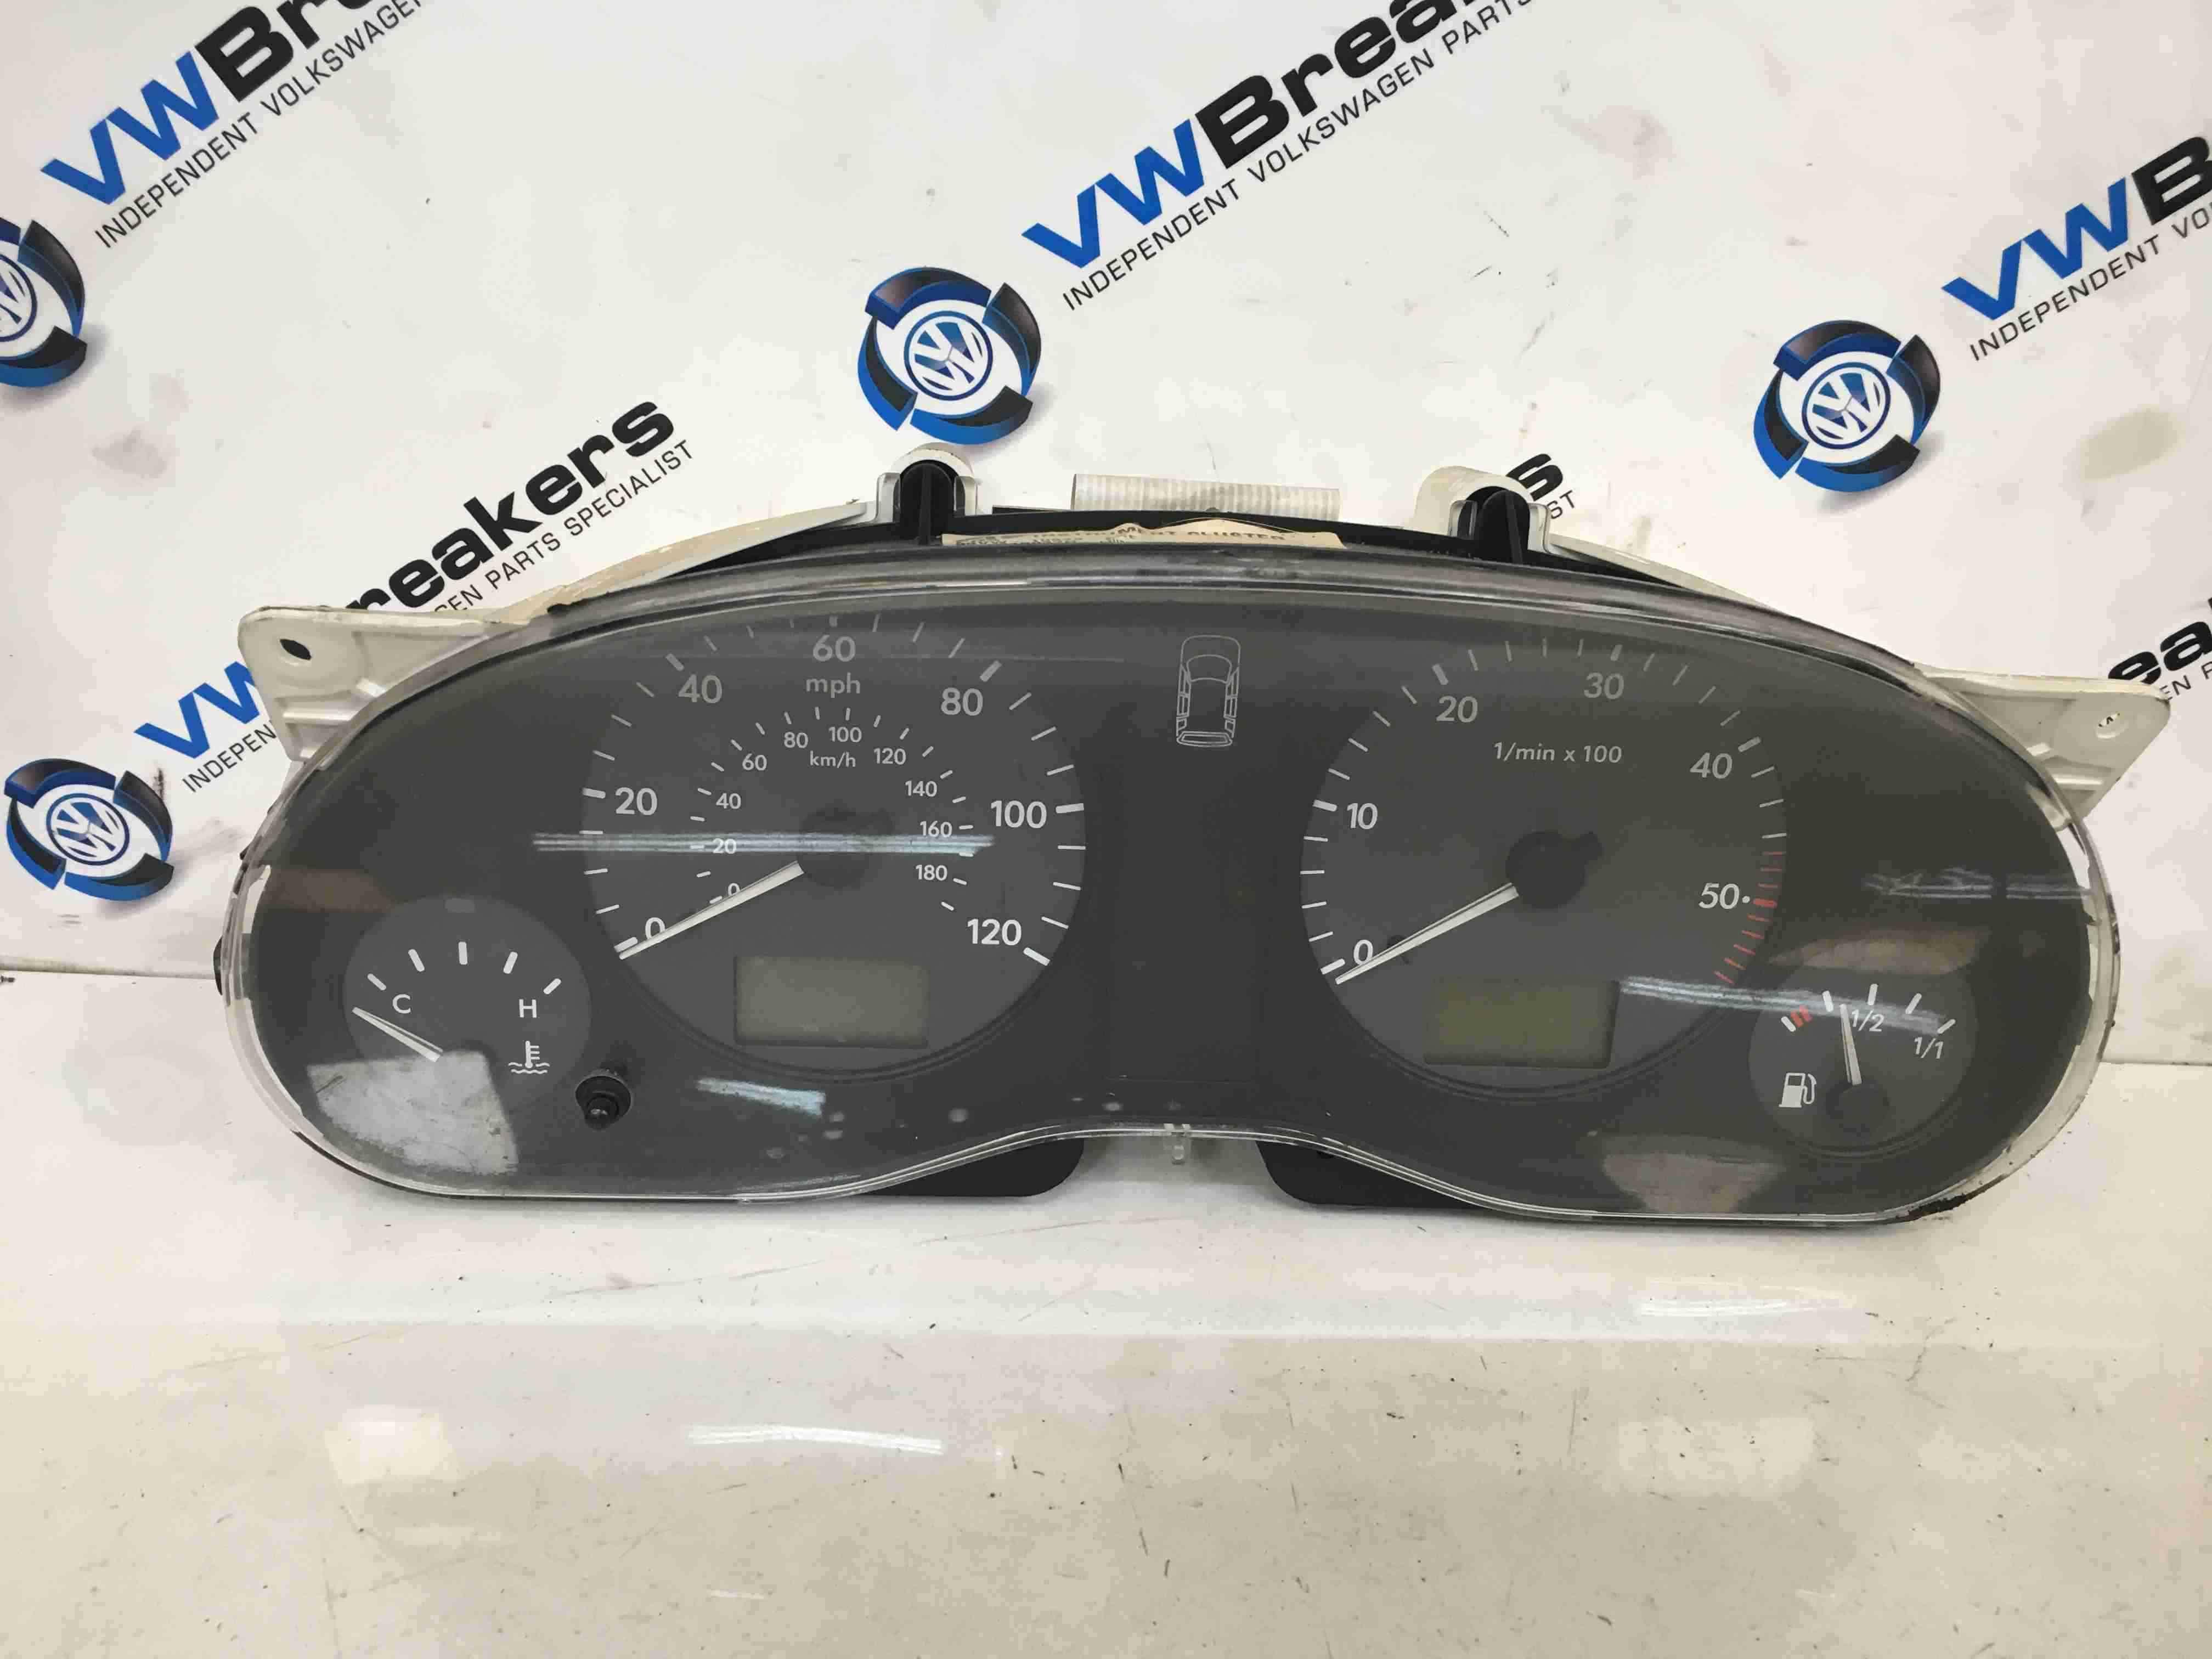 Volkswagen Sharan 1995-2003 Instrument Panel Clocks Dials Gauges Cluster 198K